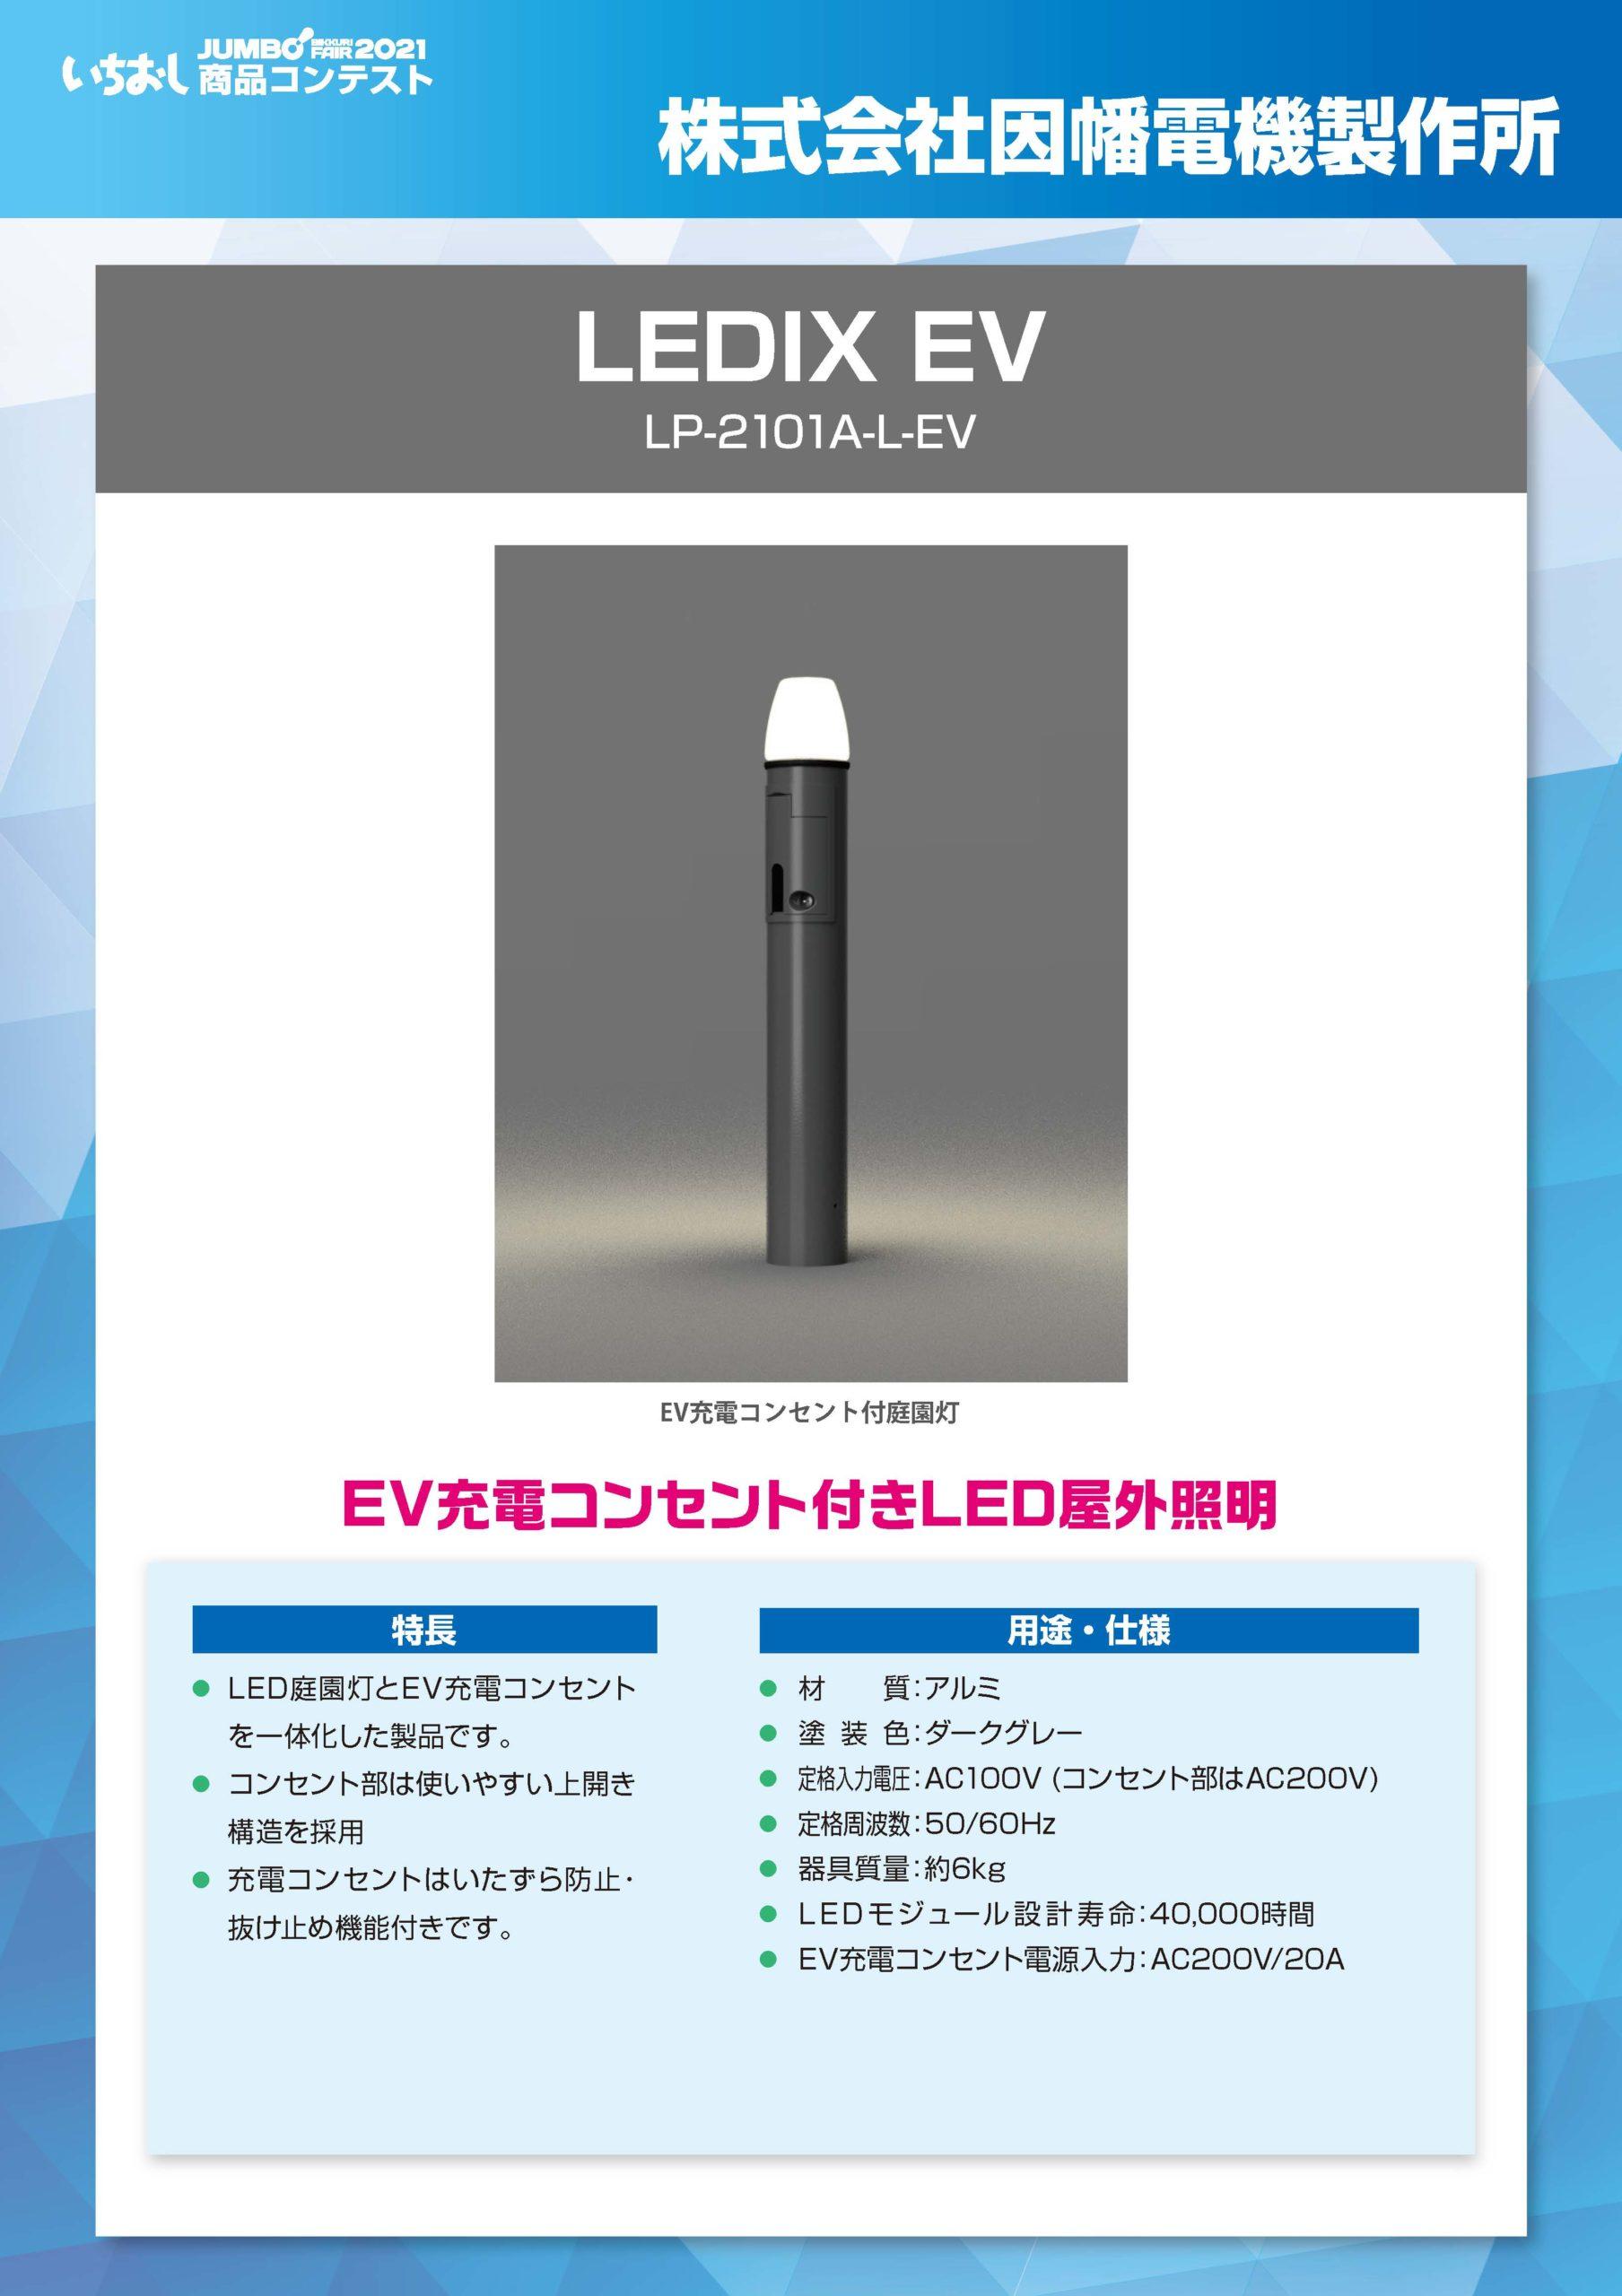 「LEDIX EV」株式会社因幡電機製作所の画像